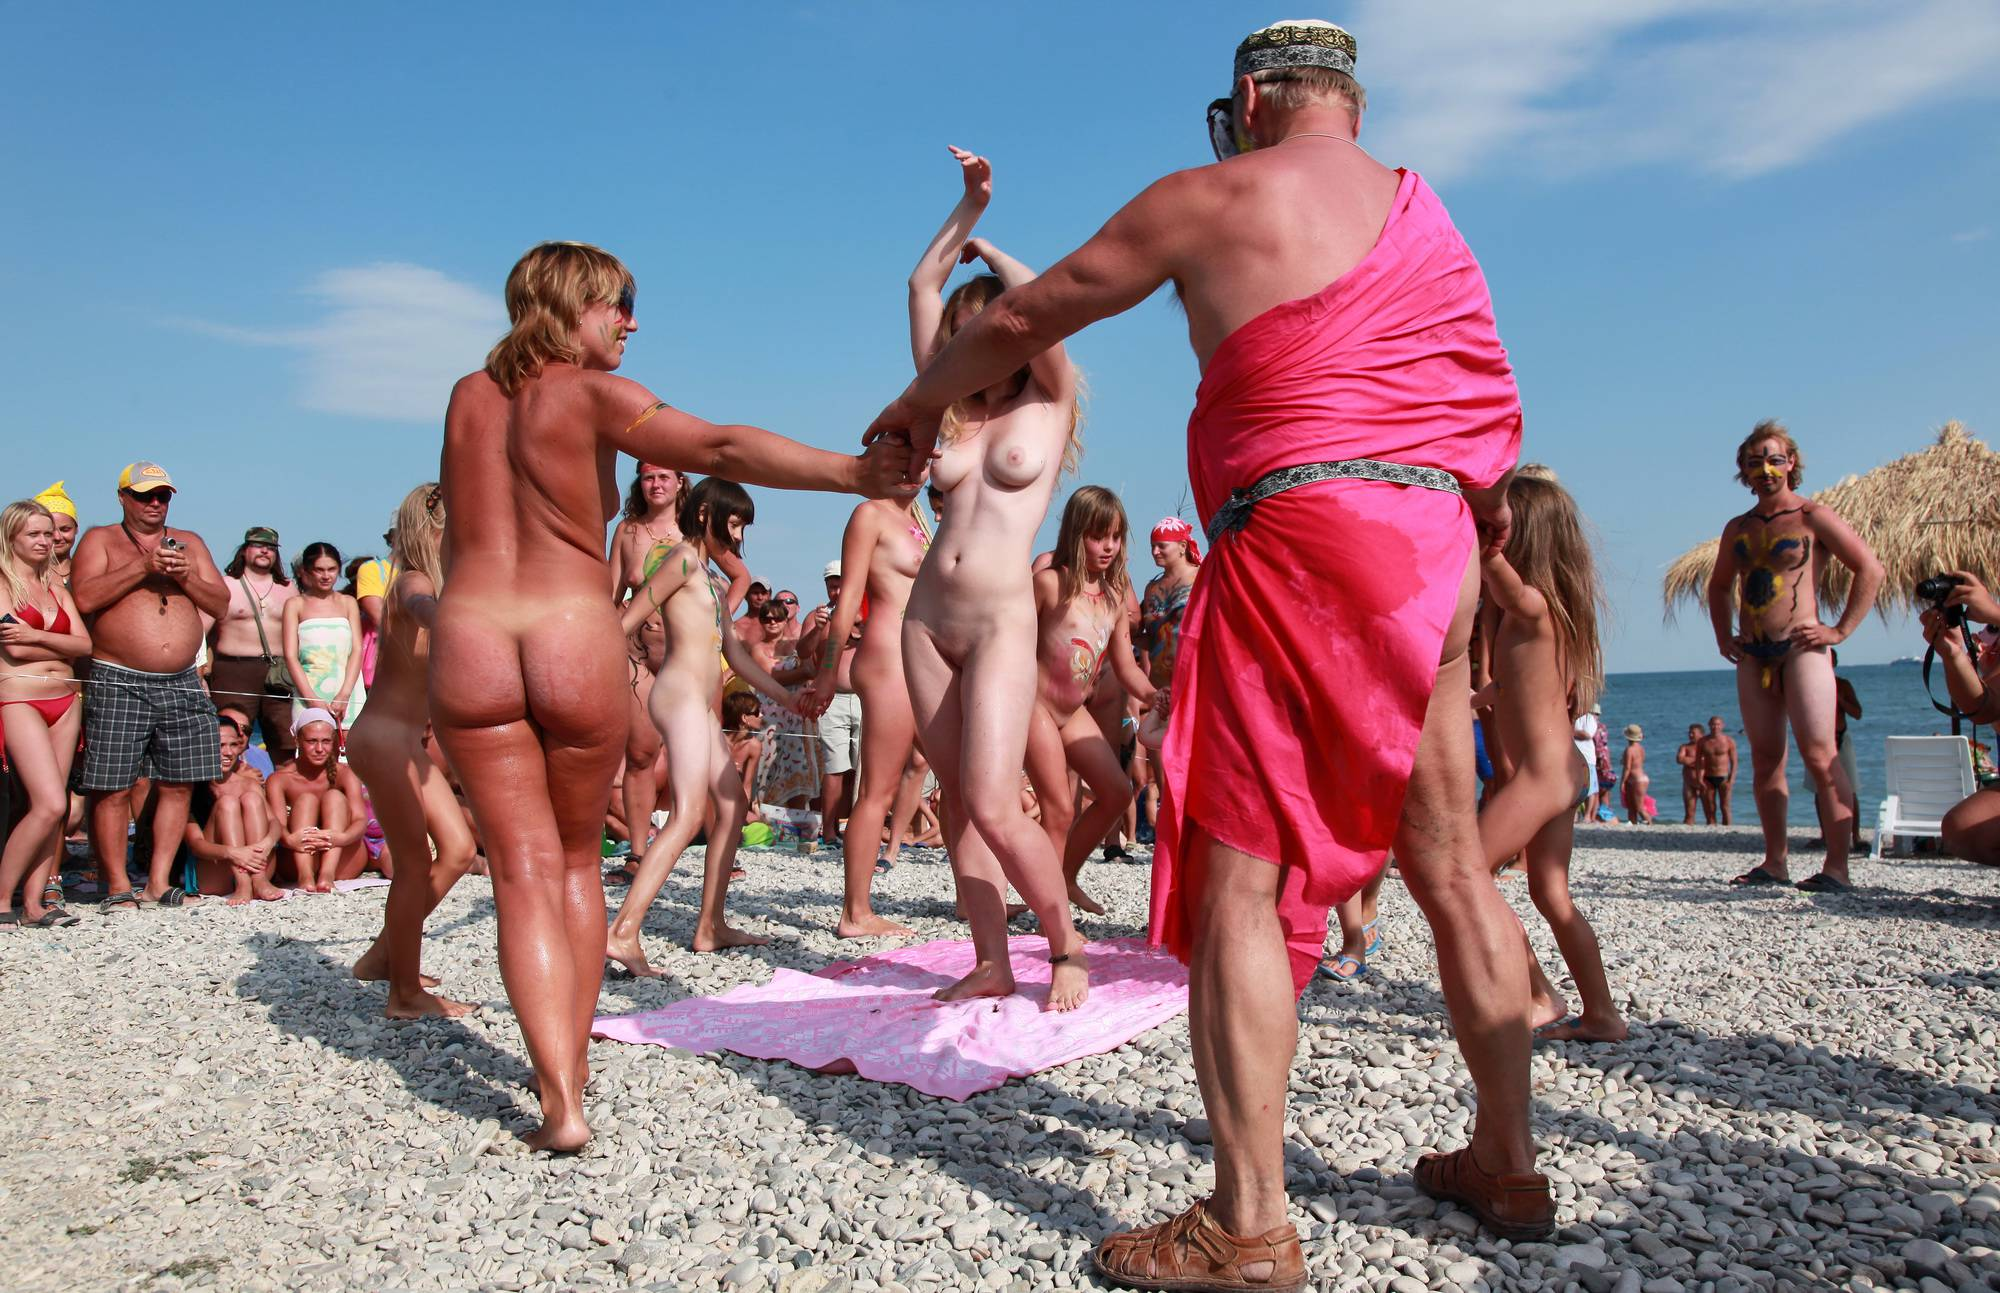 Nudist Pics Naturist Circular Dancing - 2